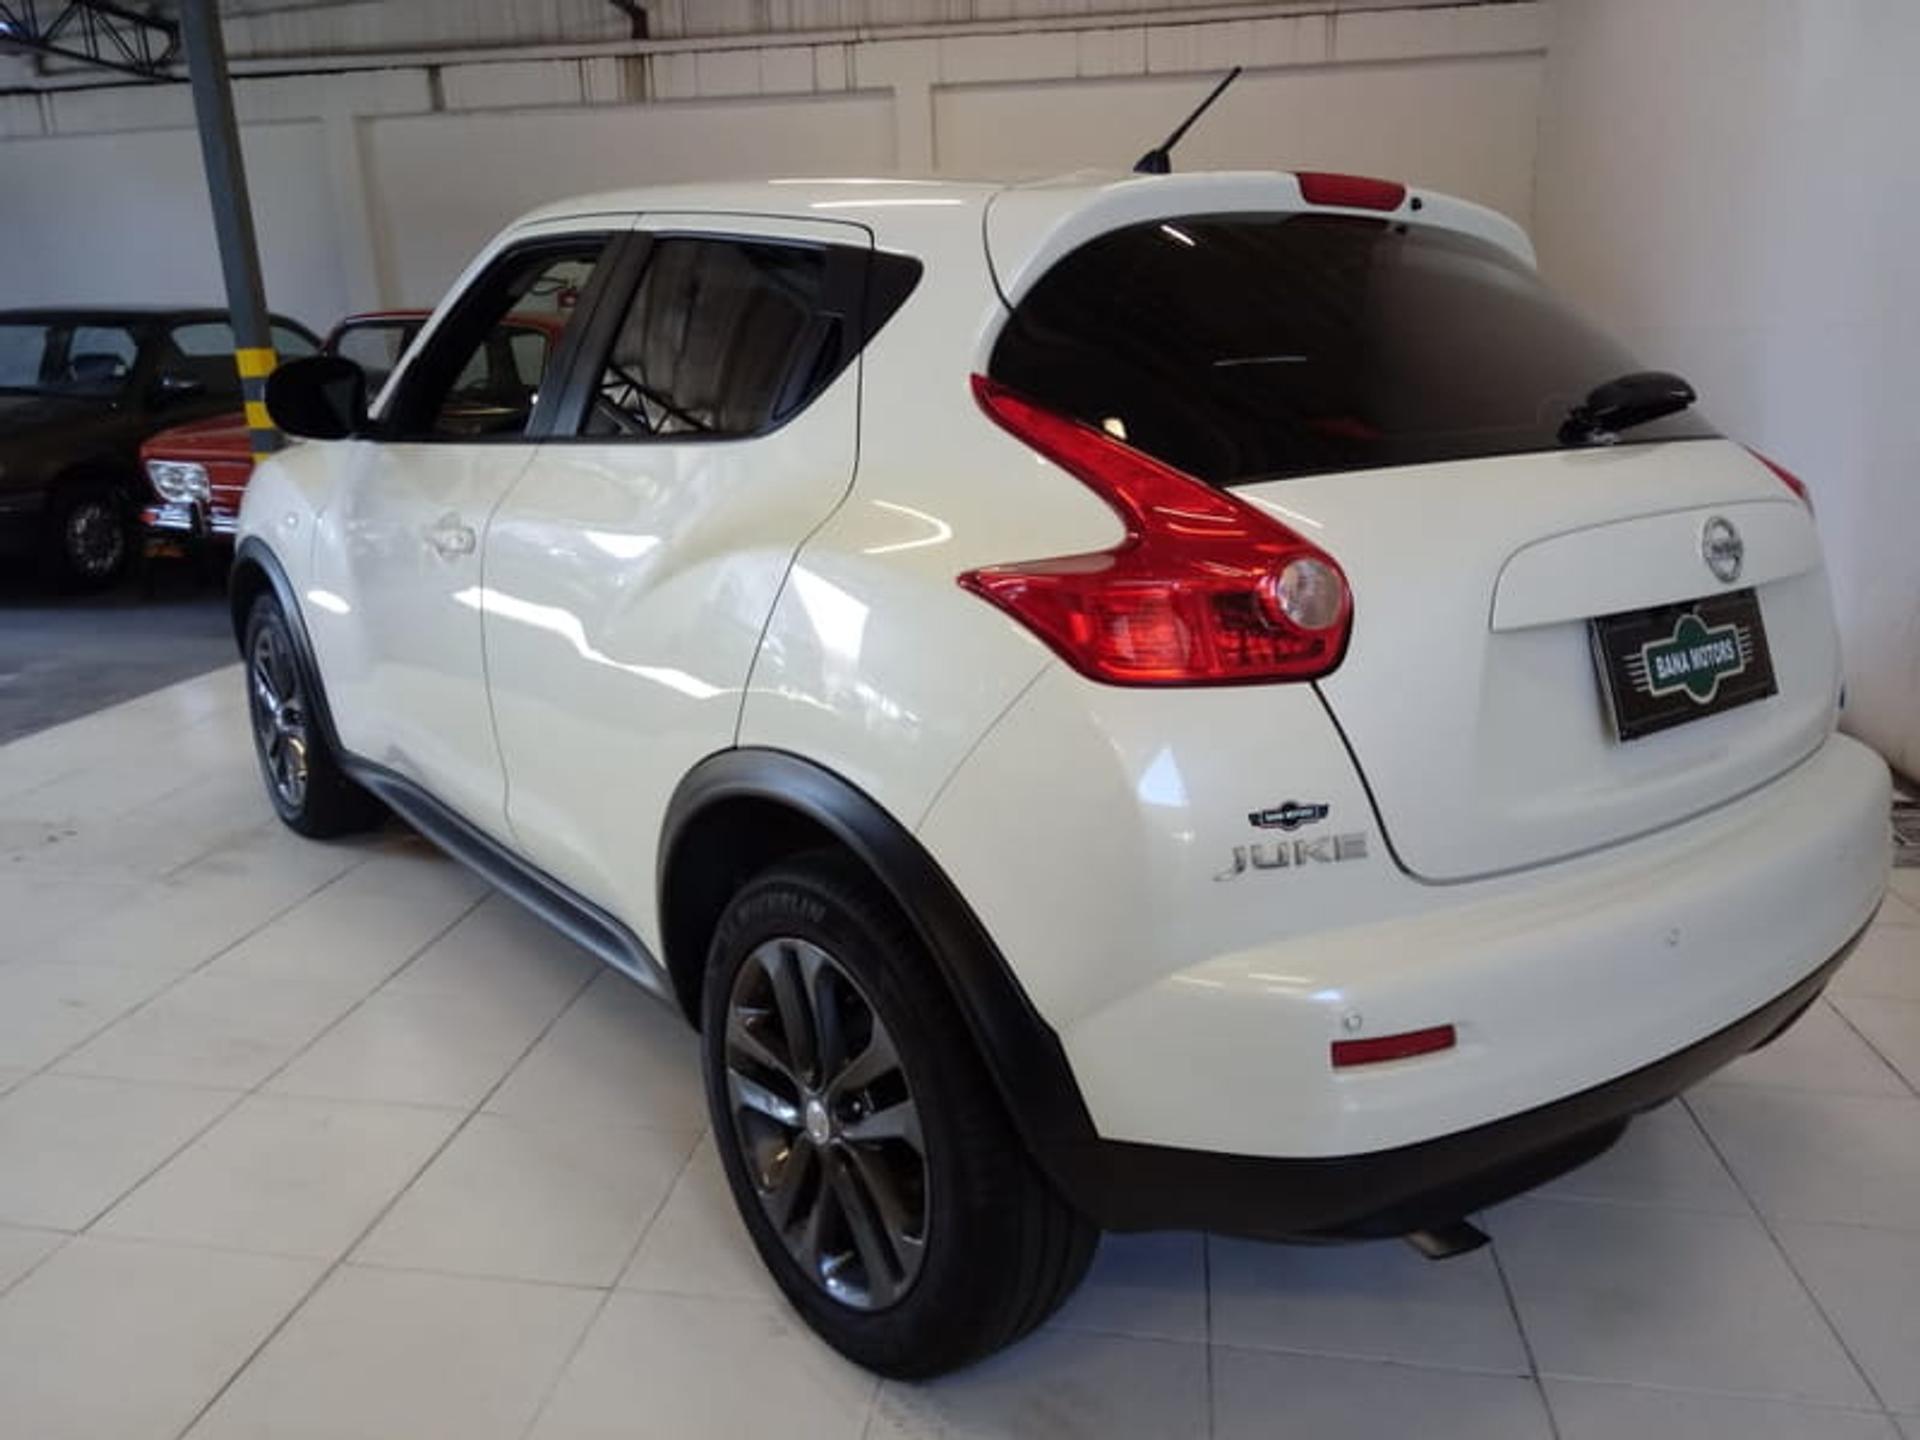 Nissan Juke 1.6 Turbo Gasolina S Awd Cvt Wmimagem09484796929